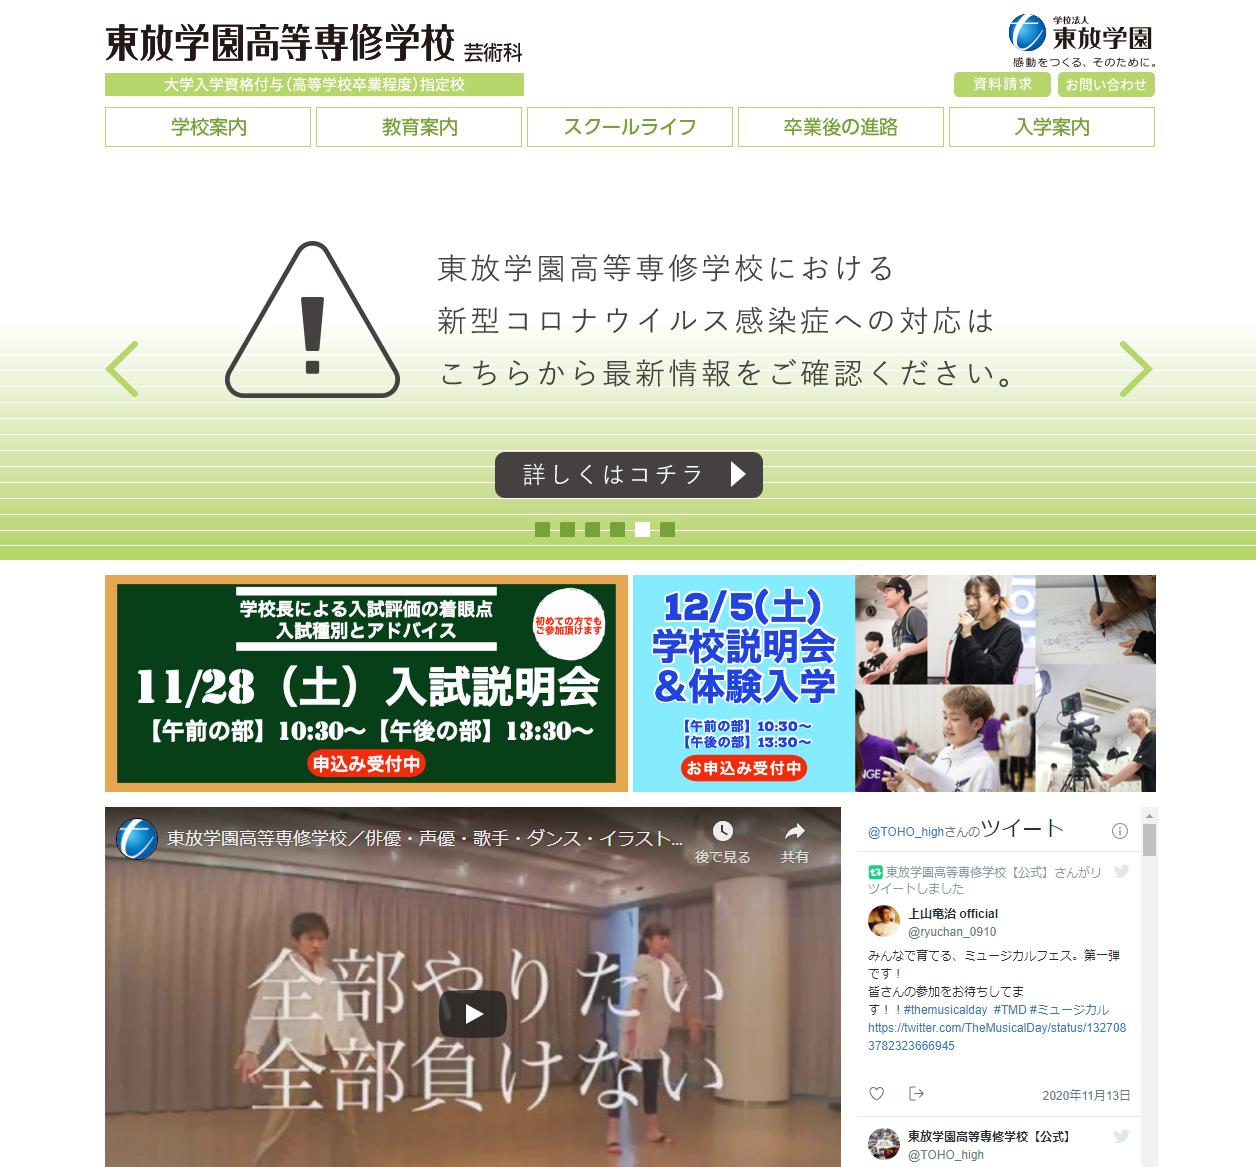 "<span class=""title"">東放学園高等専修学校の口コミや評判</span>"